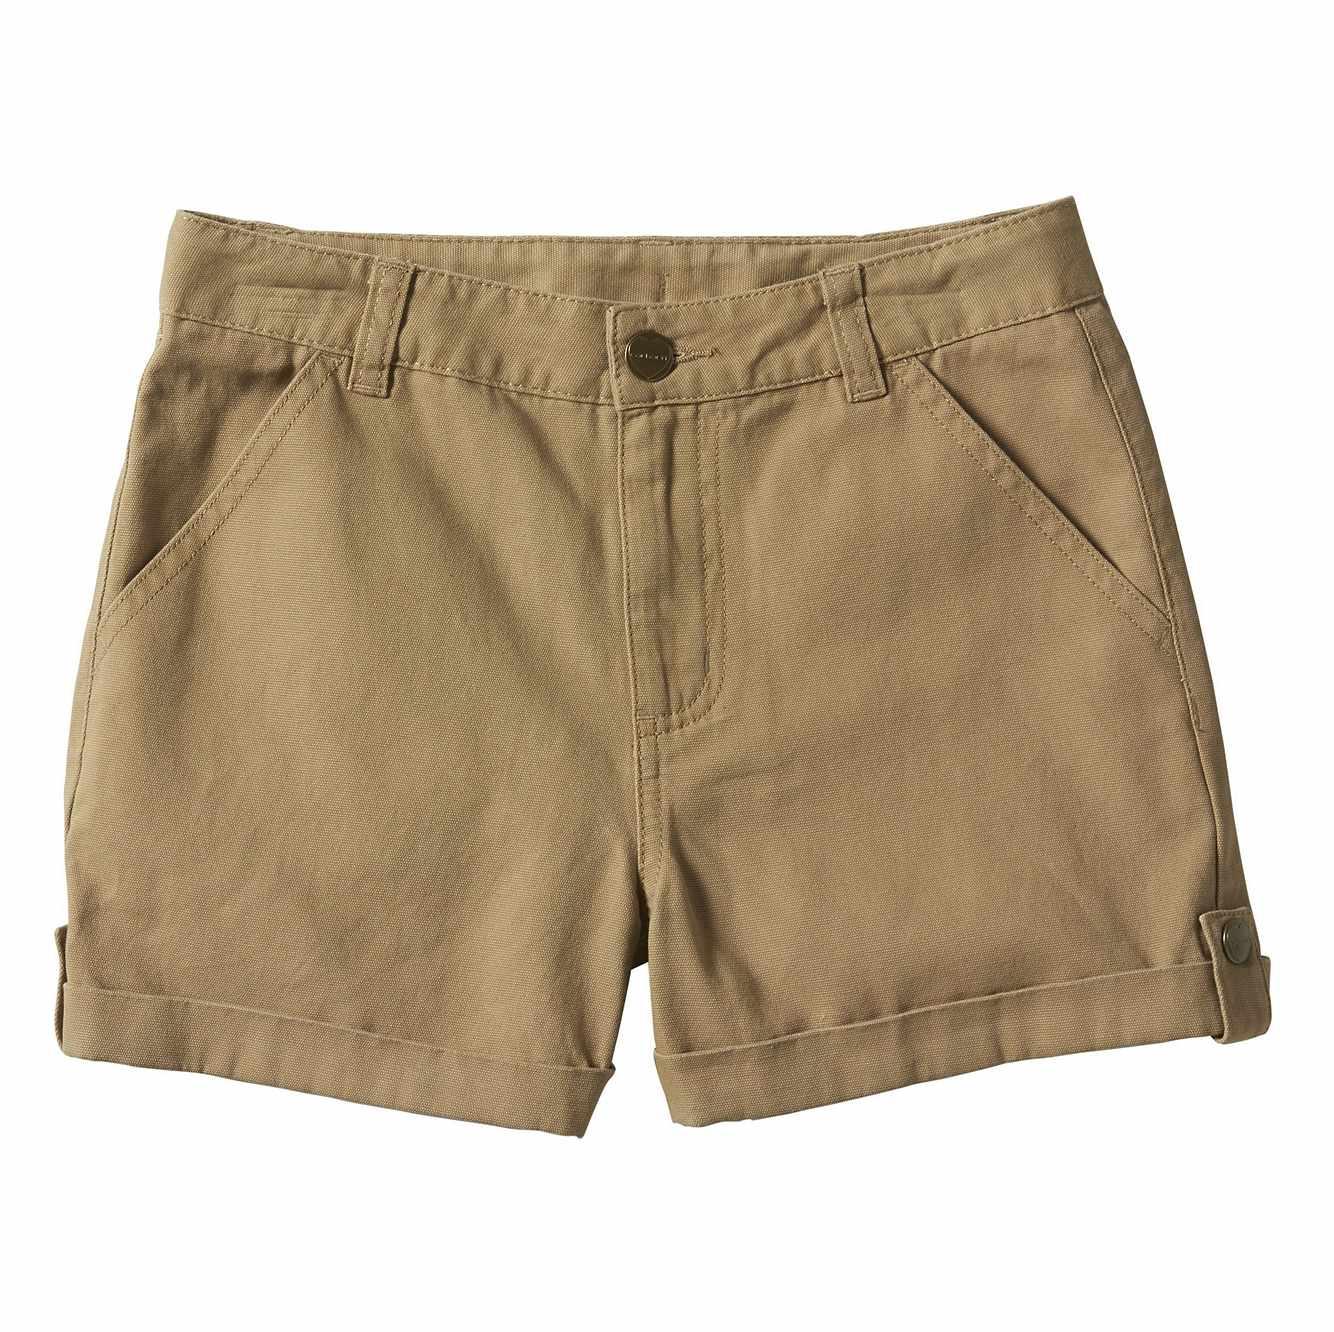 Picture of Rugged Flex® Ripstop Convertible Short in Dark Khaki